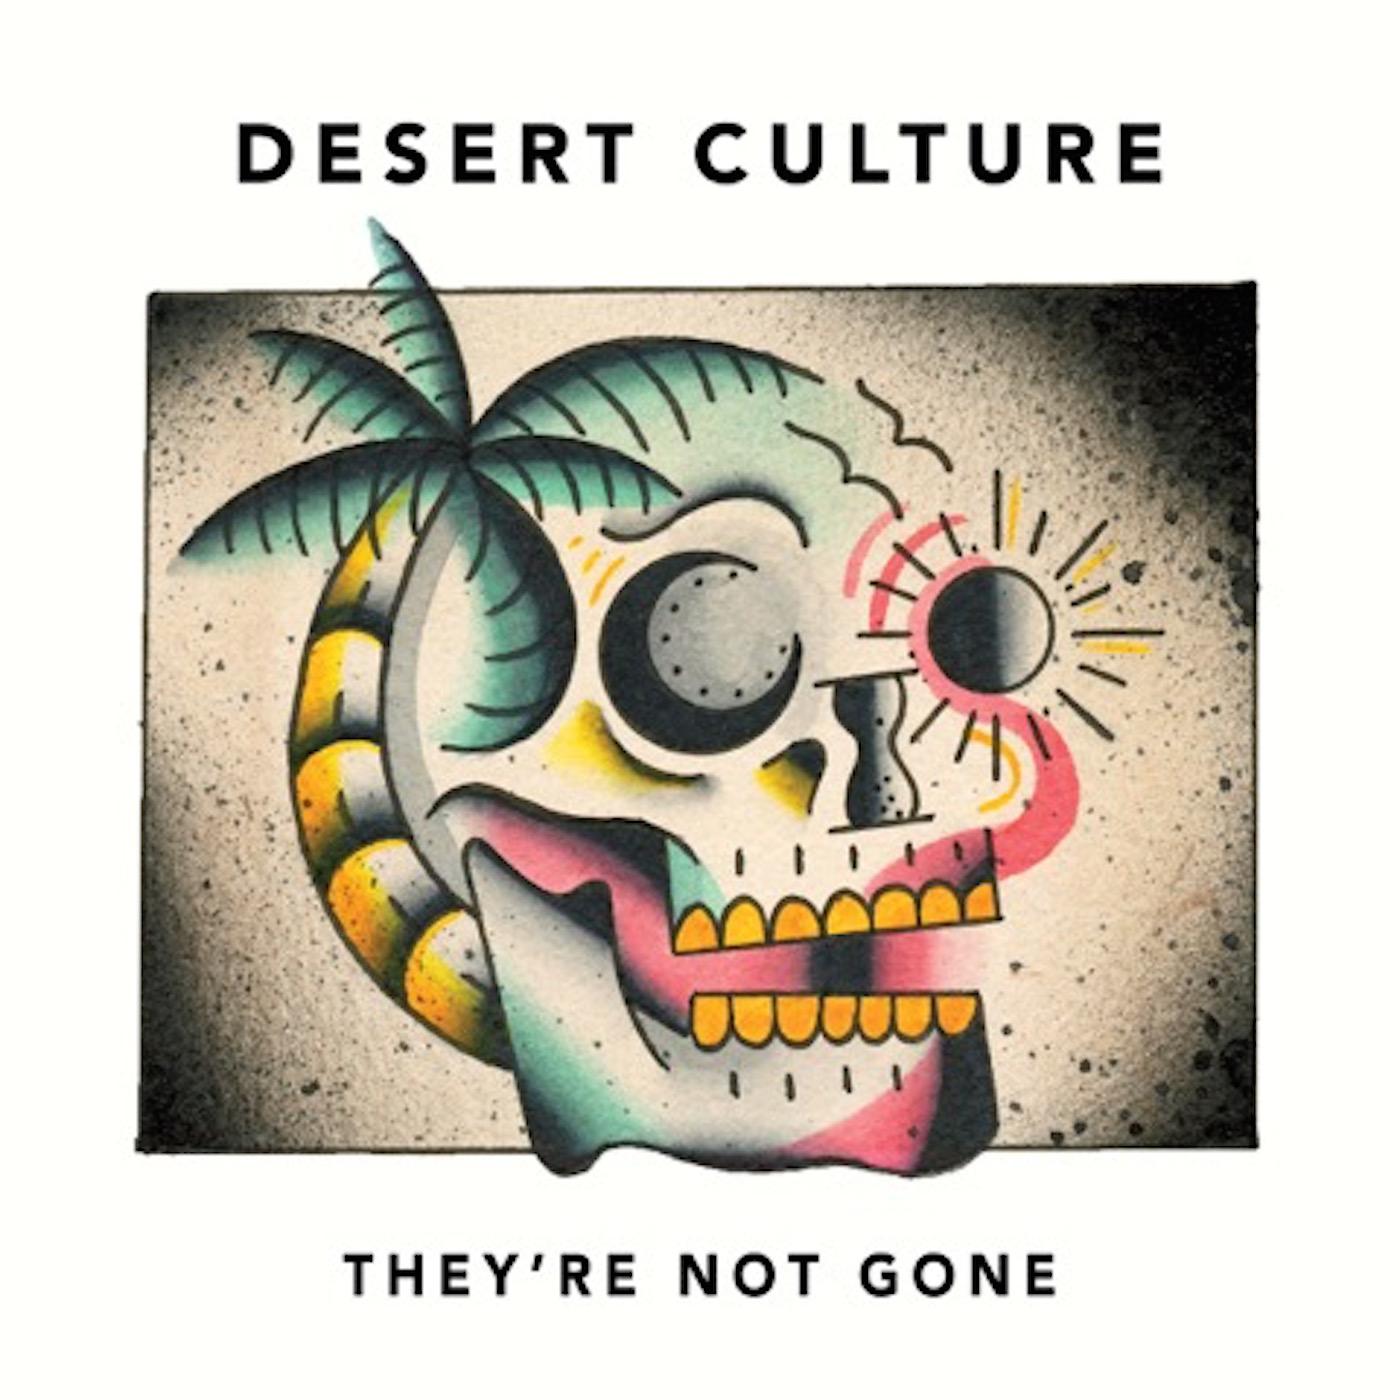 DesertCulture_TheyreNotGone_albumcover.jpeg